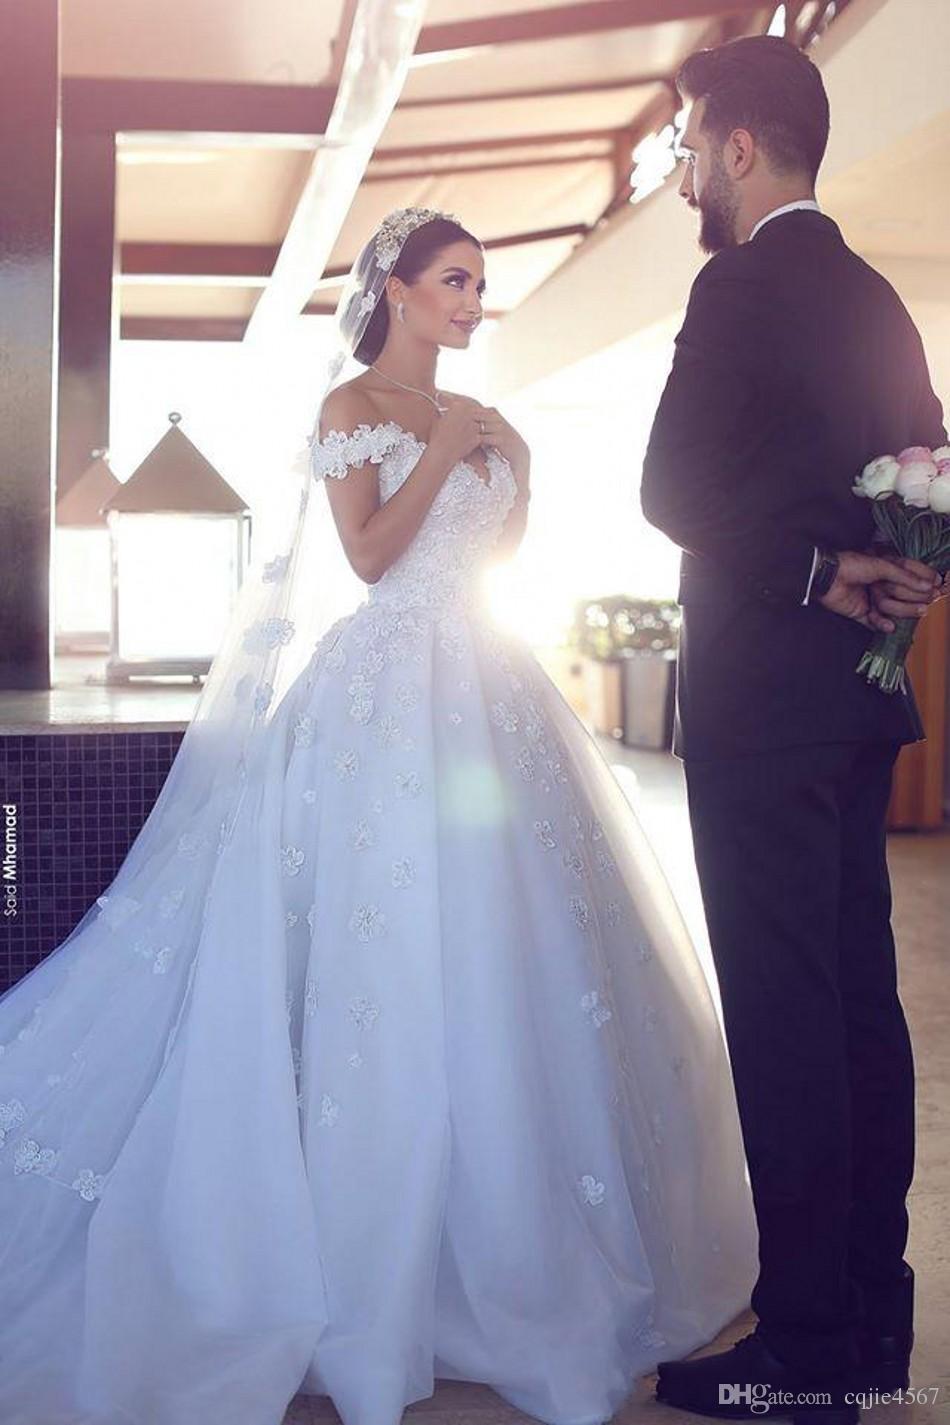 2019 New Vintage Said Mhamad Castle Wedding Dresses Off Shoulder Appliques Lace Chapel Train Custom Made Arabic Wedding Bridal Gowns 516